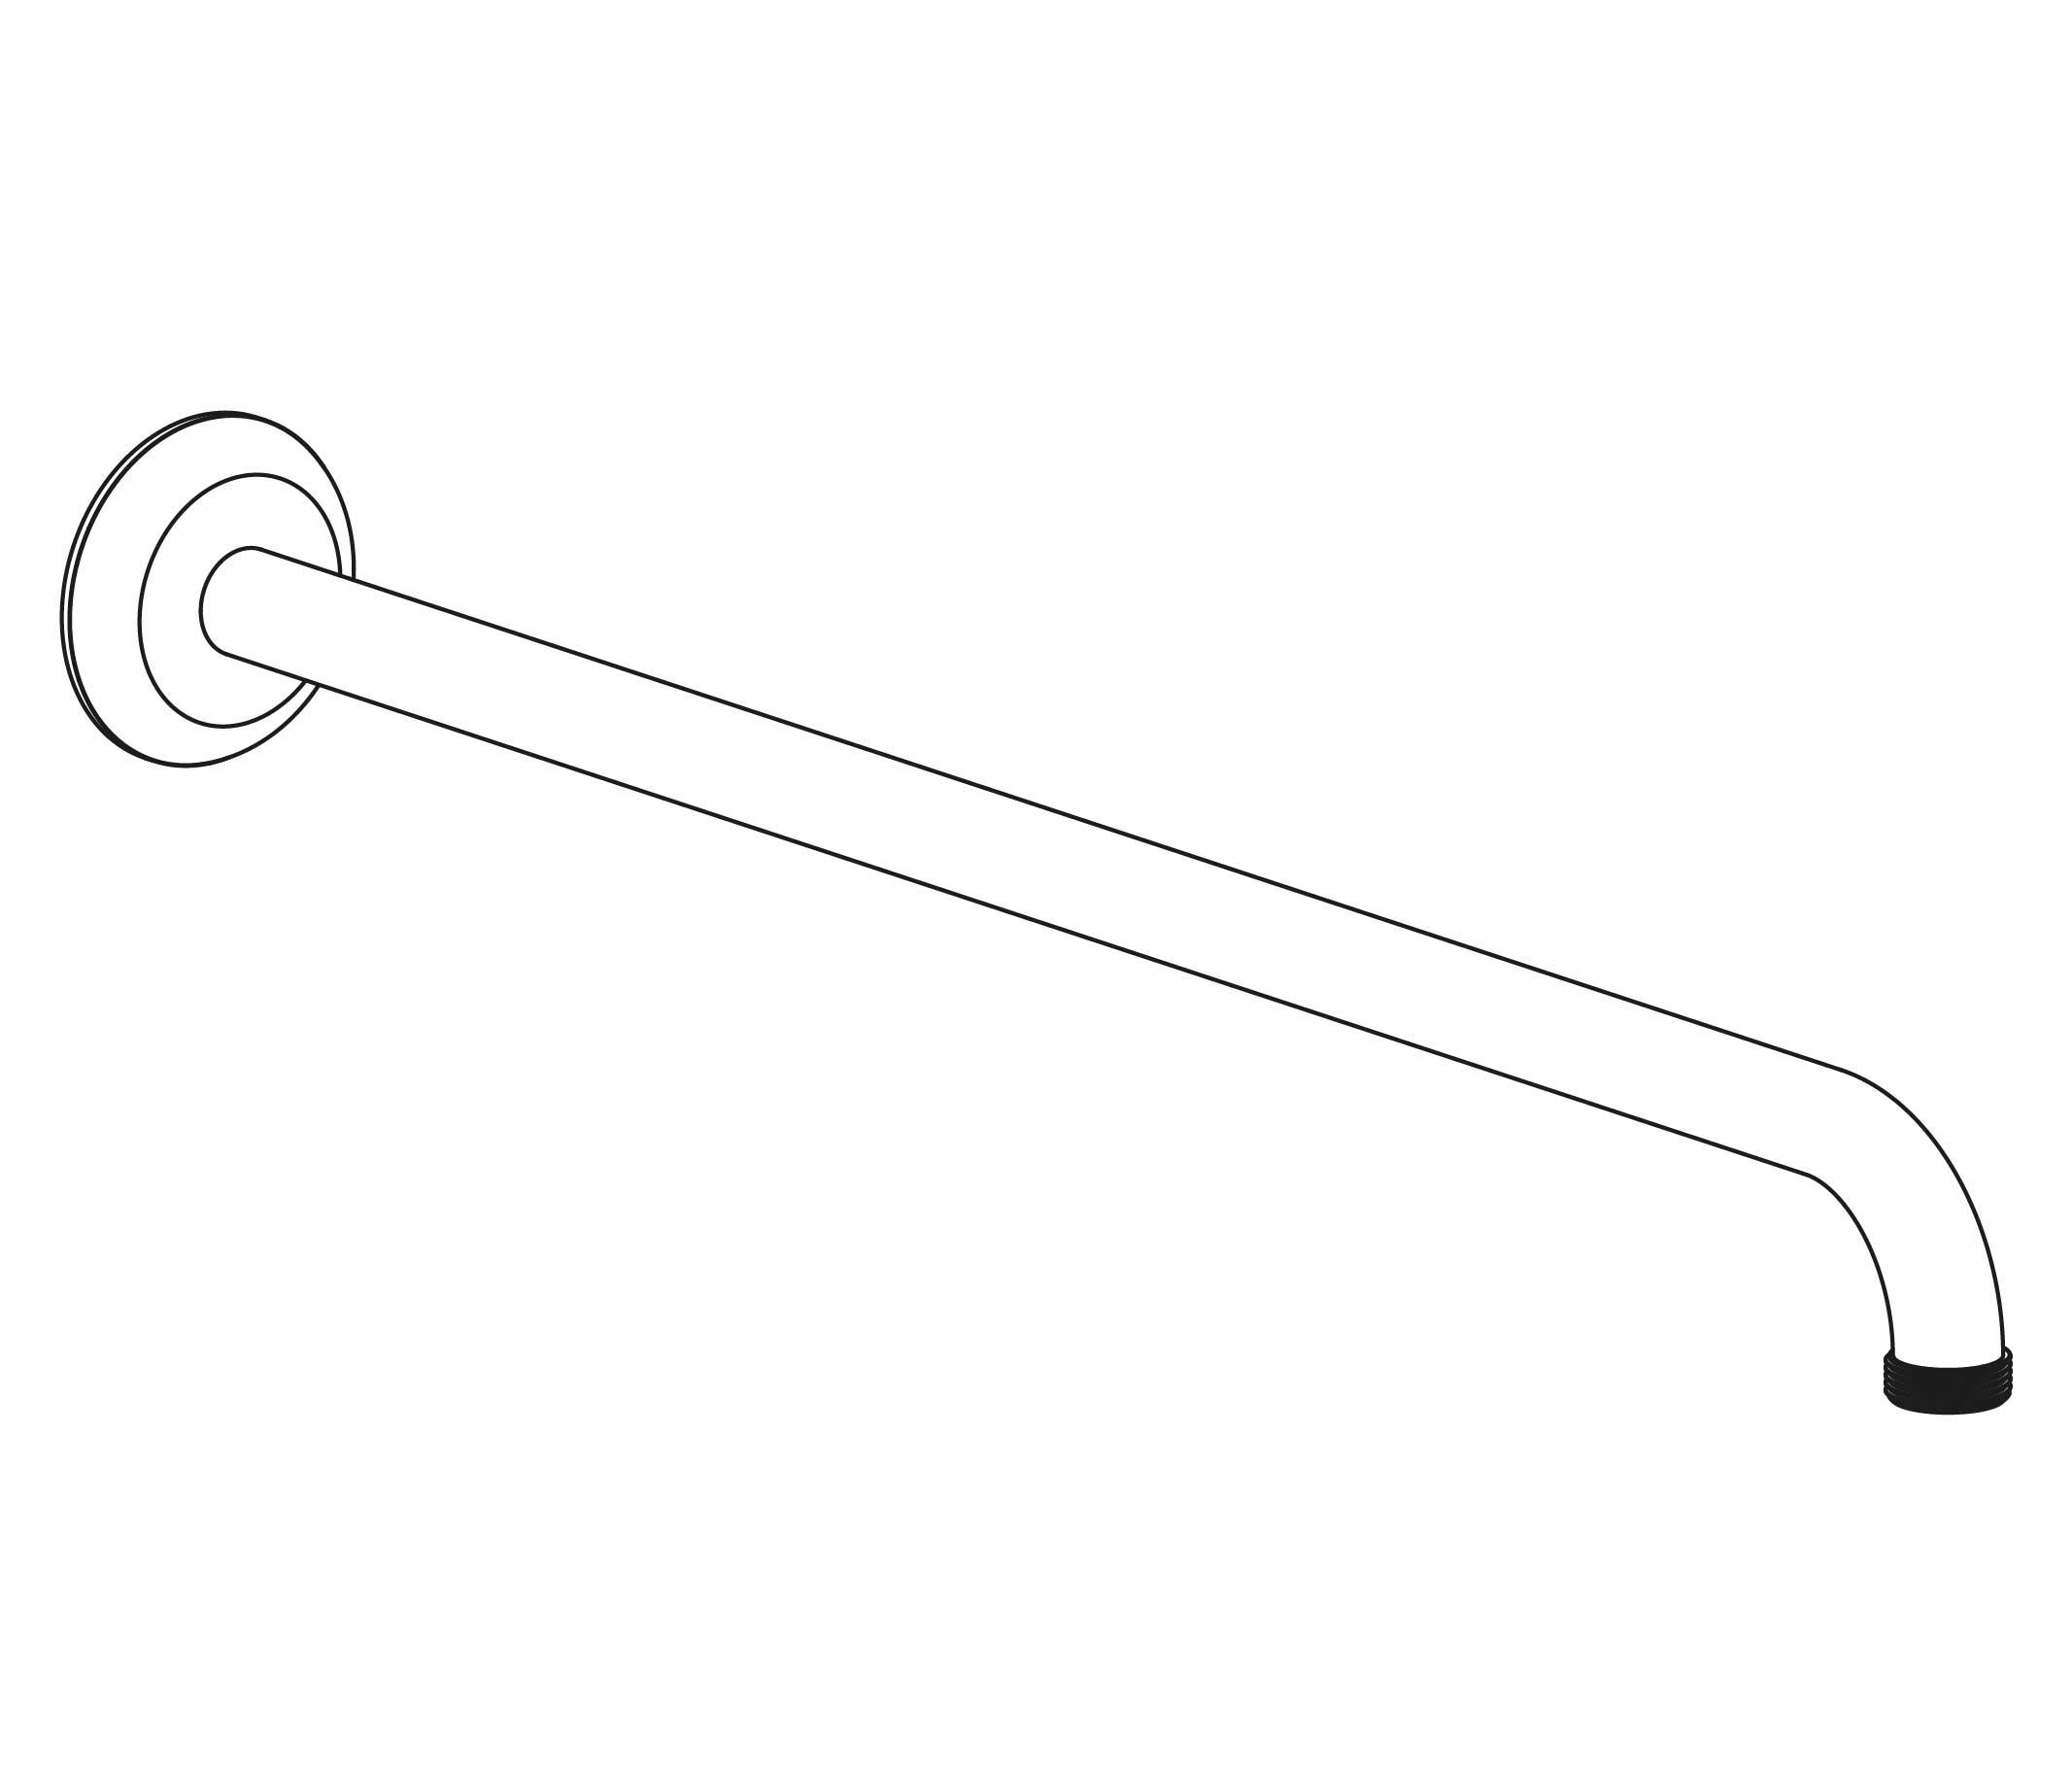 c46-2w450 bras de douche mural 450mm